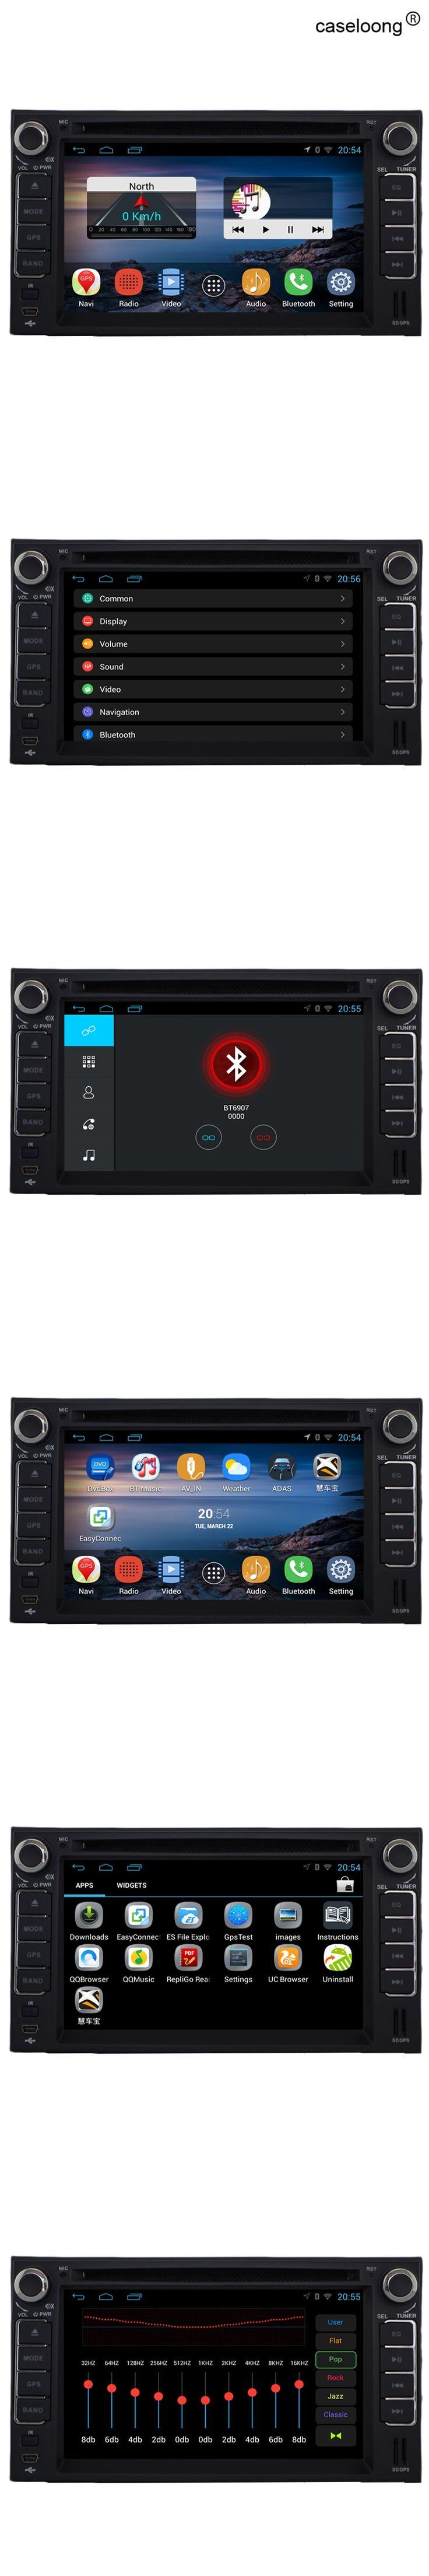 Quad Core Android Car DVD for Kia Sorento Cerato Sportage Spectra Rondo Carens Optima Magentis GPS Head Unit Car radio